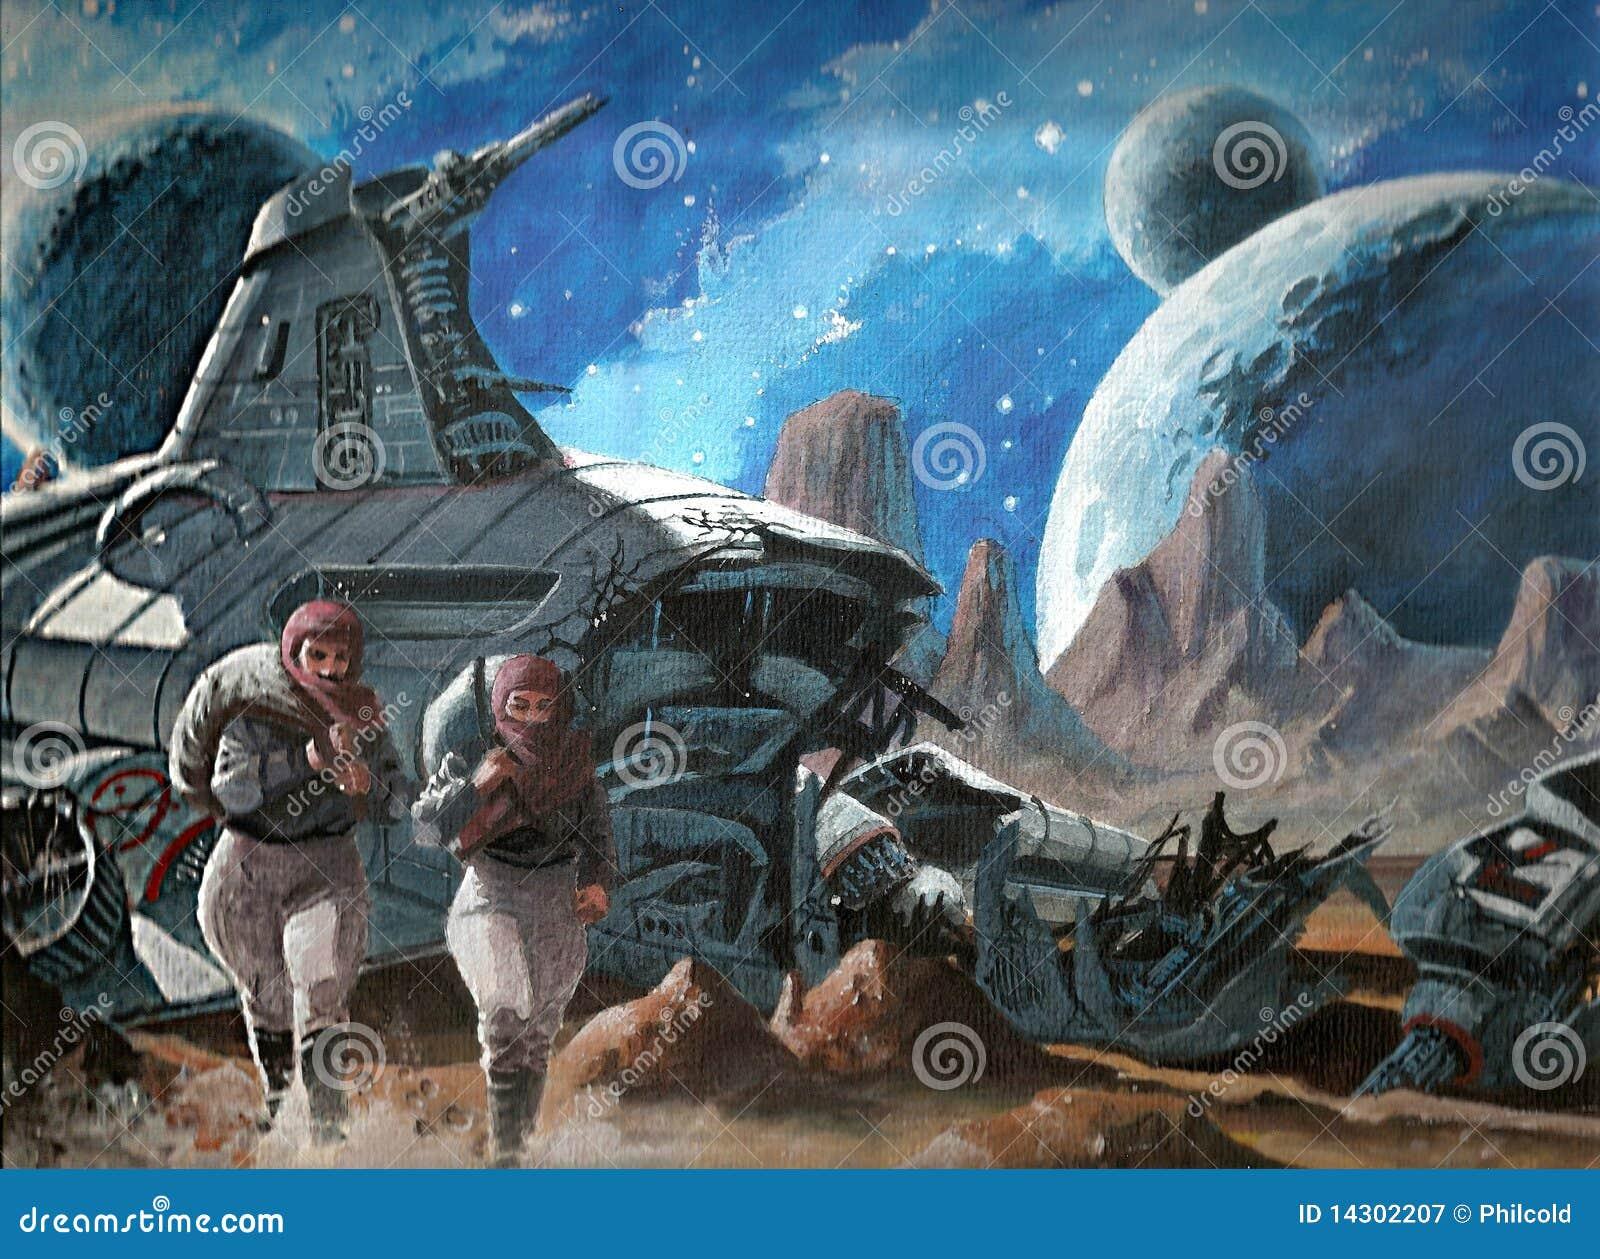 space ship crash - photo #44